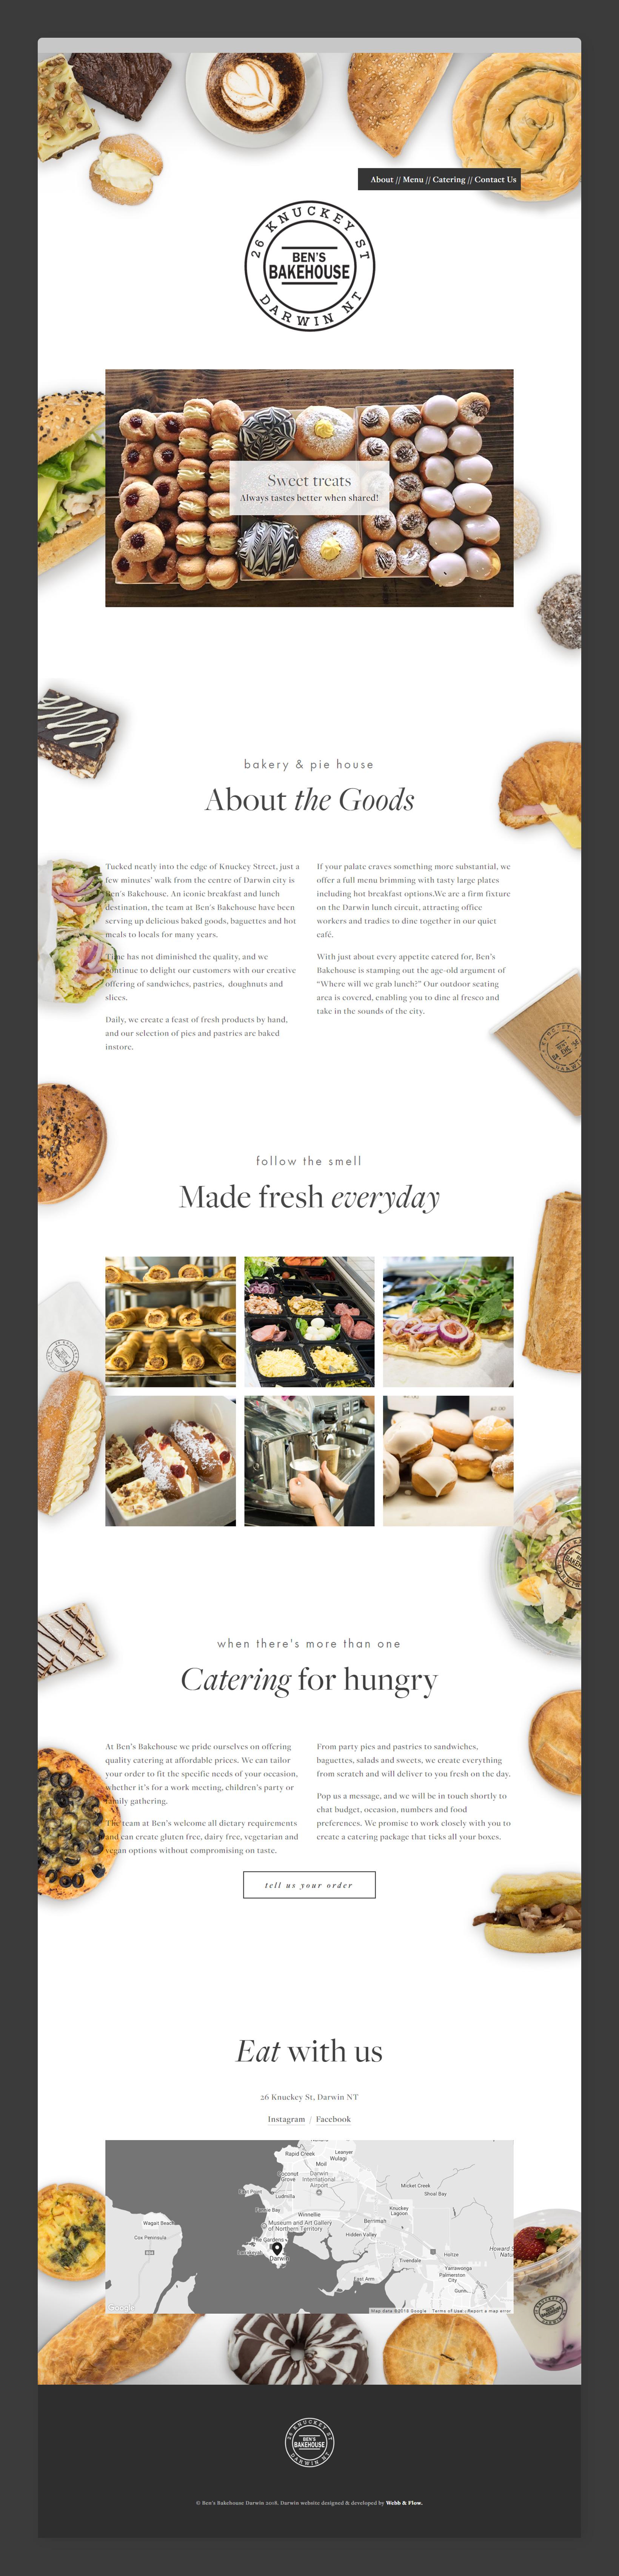 WebbFlow-portfolio-browser-Bensbakehouse2.jpg